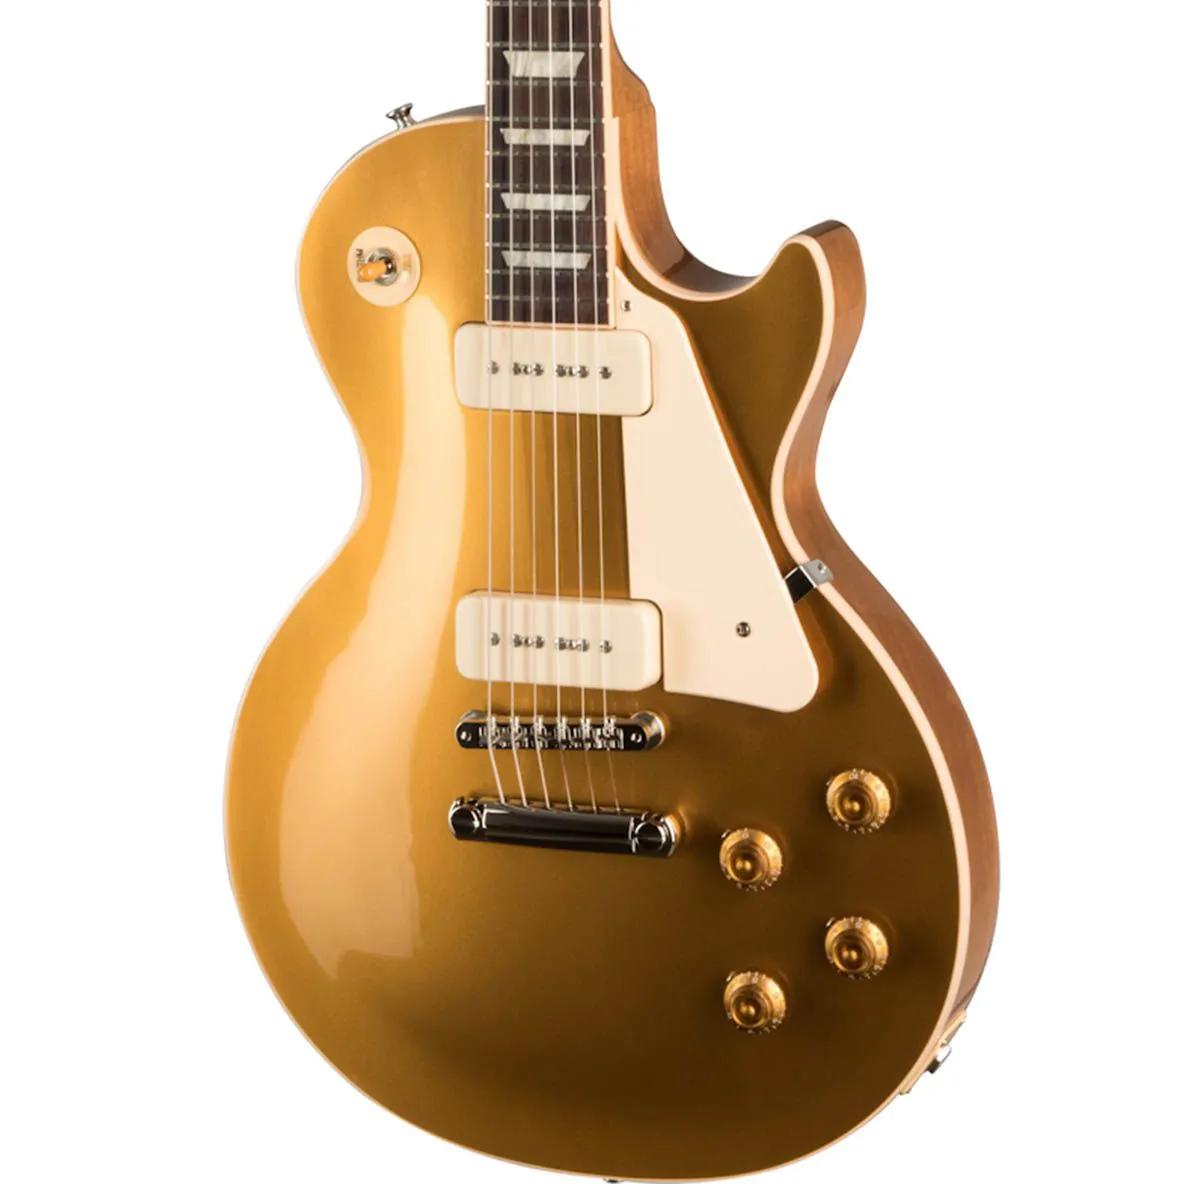 Guitarra Gibson Les Paul Stantard 50s P90 Gold Top